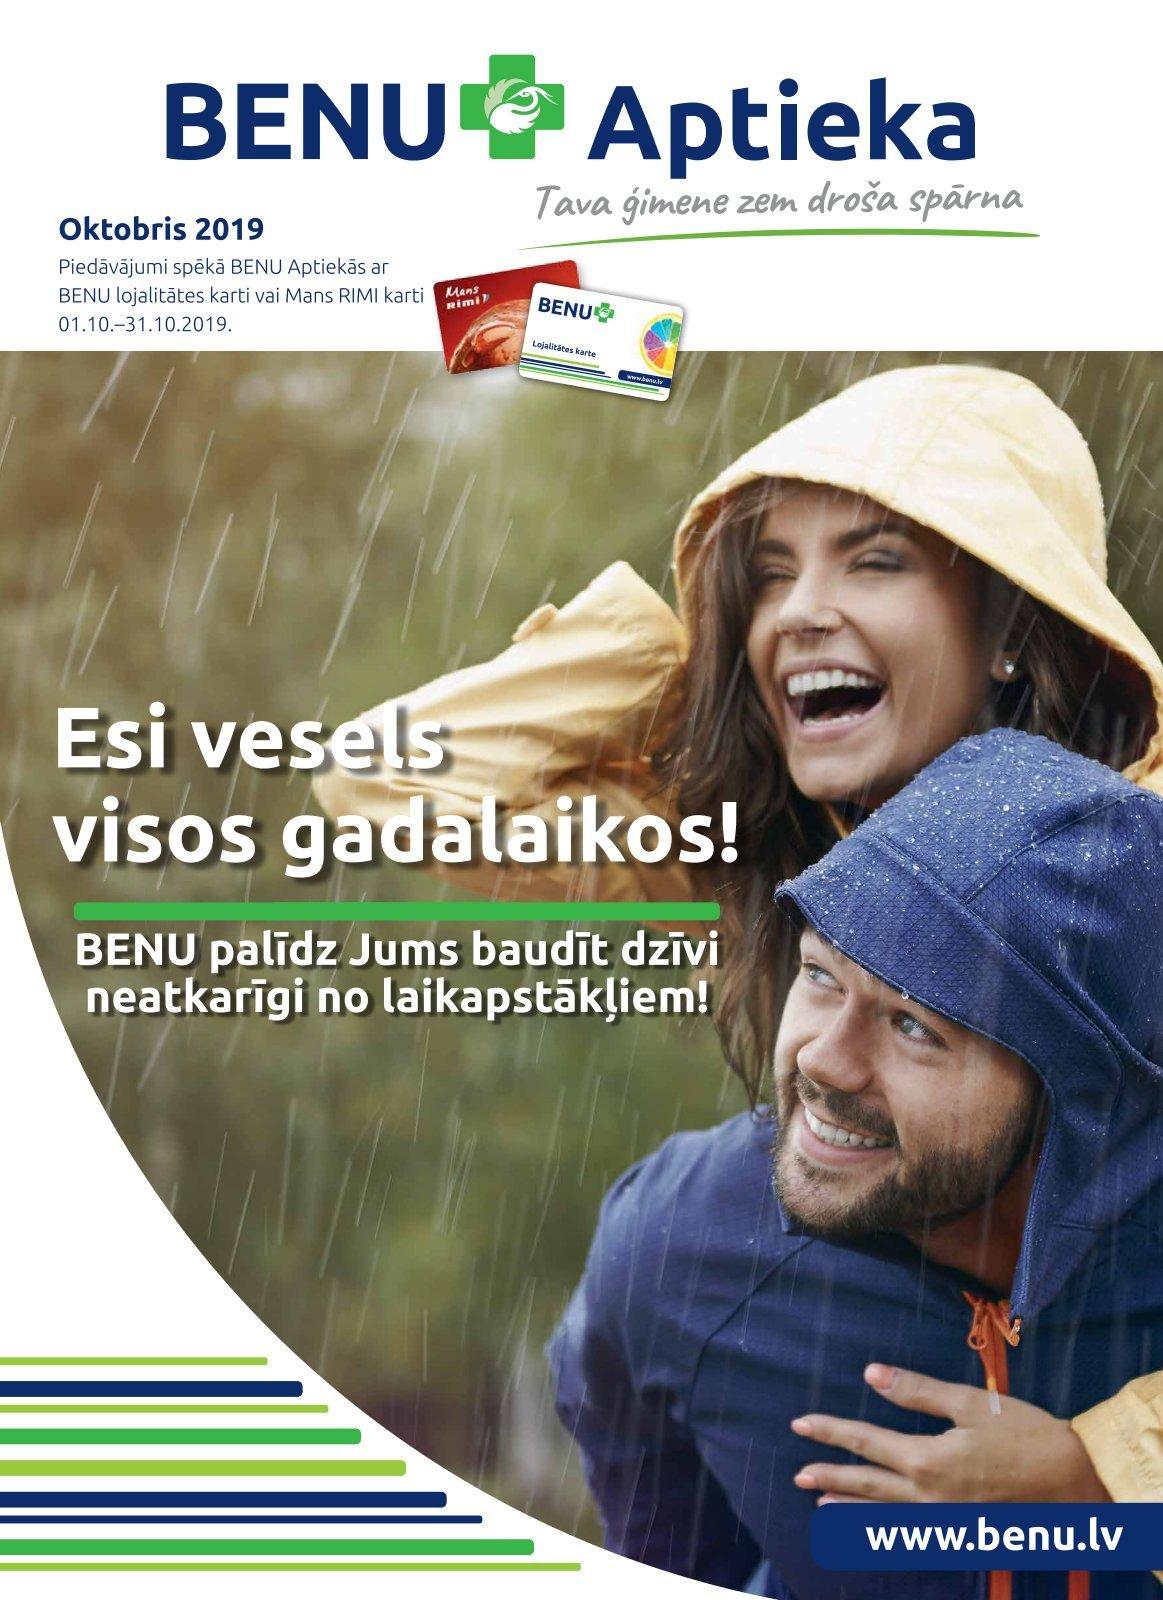 BENU akcijas buklets 01.10.2019 - 31.10.2019